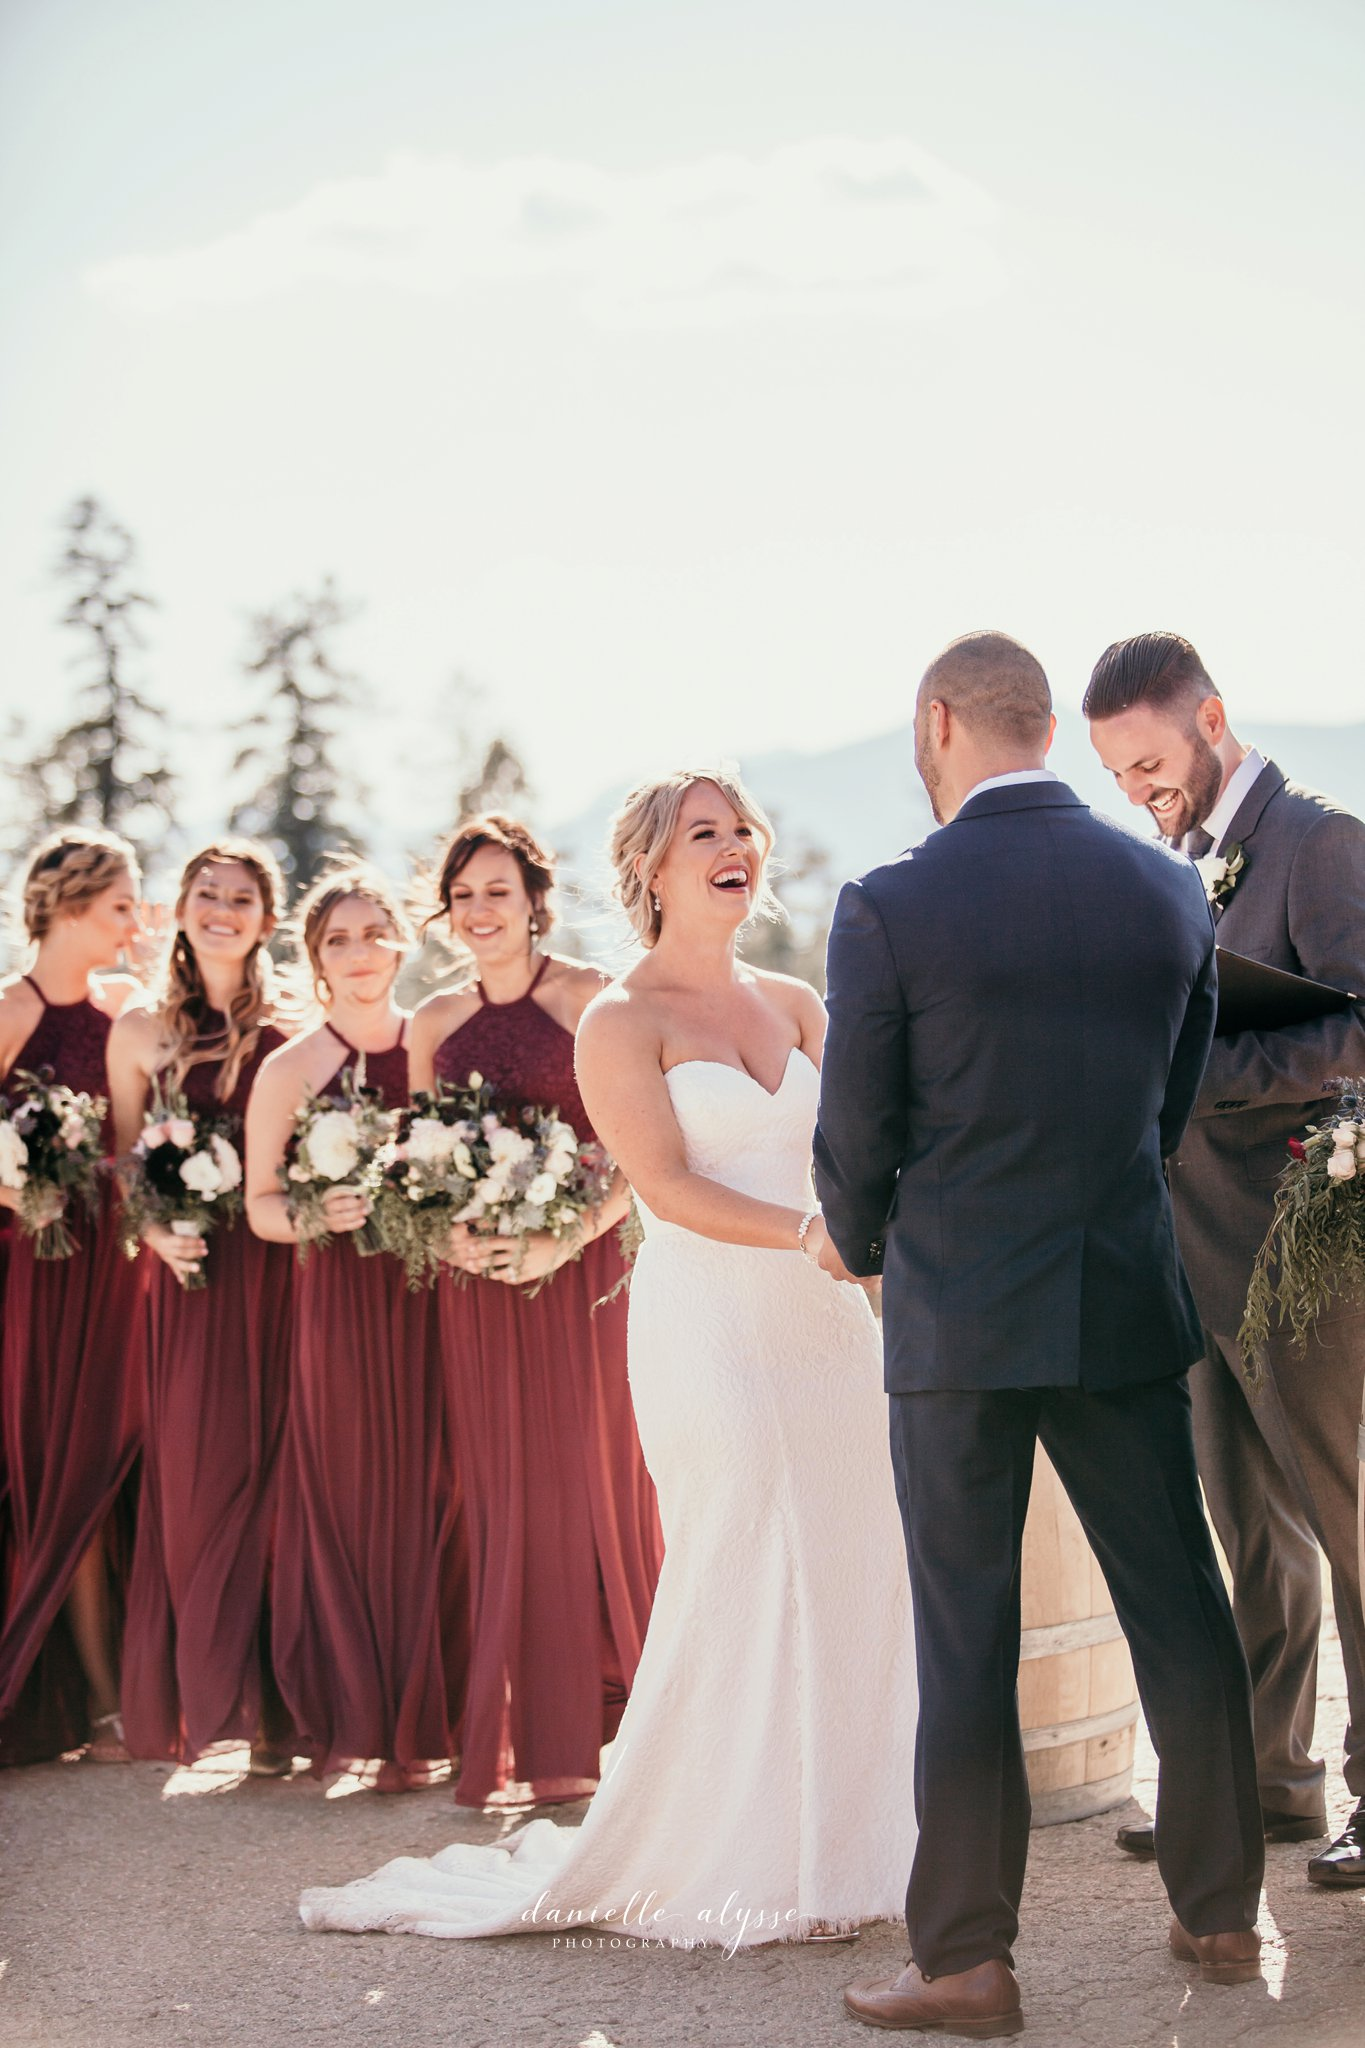 180831_wedding_stephanie_heavenly_south_lake_tahoe_danielle_alysse_photography_destination_blog_667_WEB.jpg